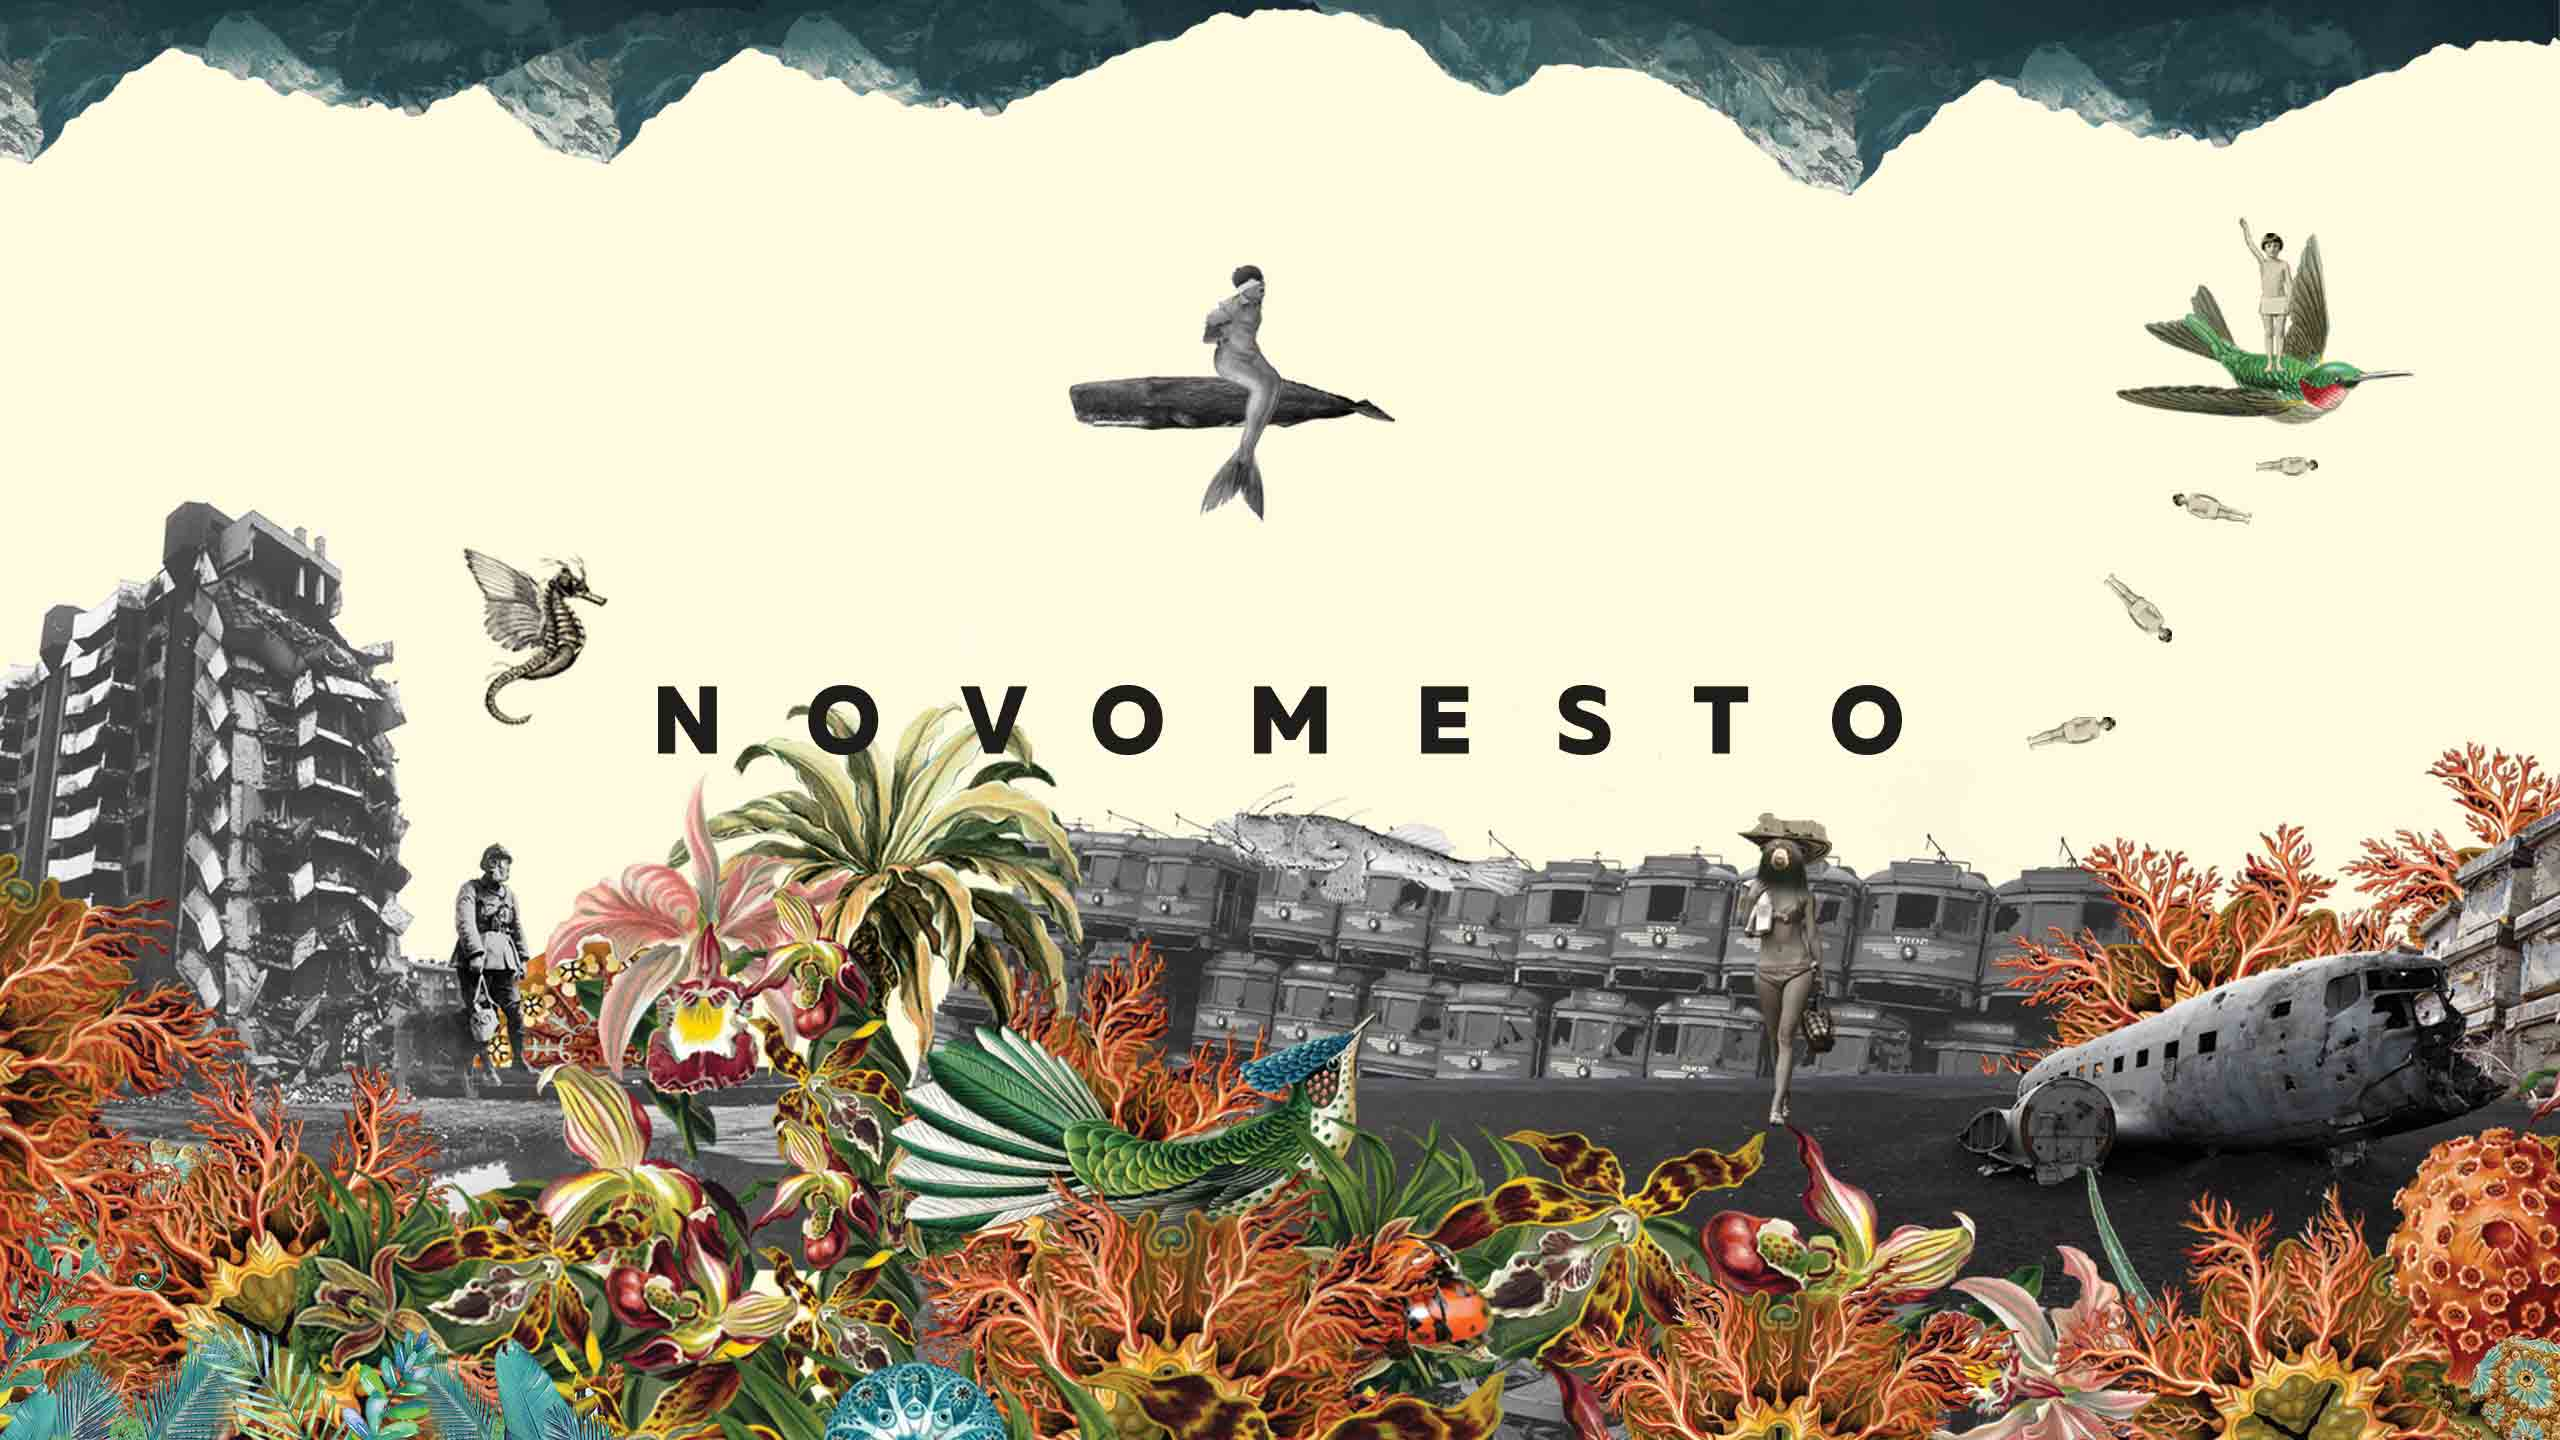 Novomesto DisculpiStudio Design - NOVOMESTO - Art Work i disseny del nou cd del grup